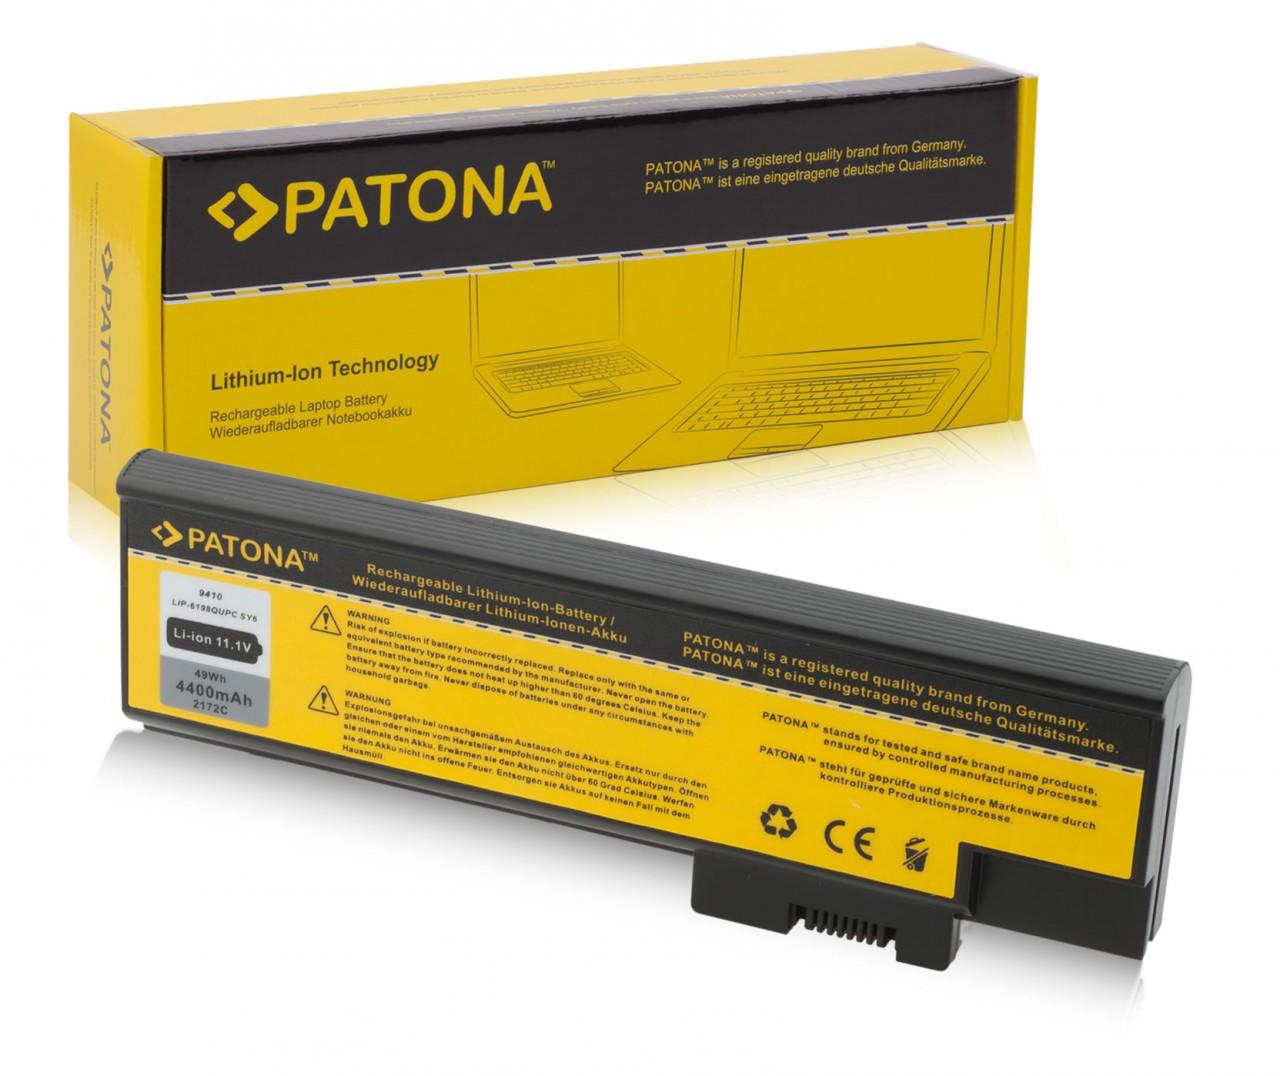 PATONA Battery Acer Aspire 5600 9300 9400 MS1295 BTP-BCA1, 1